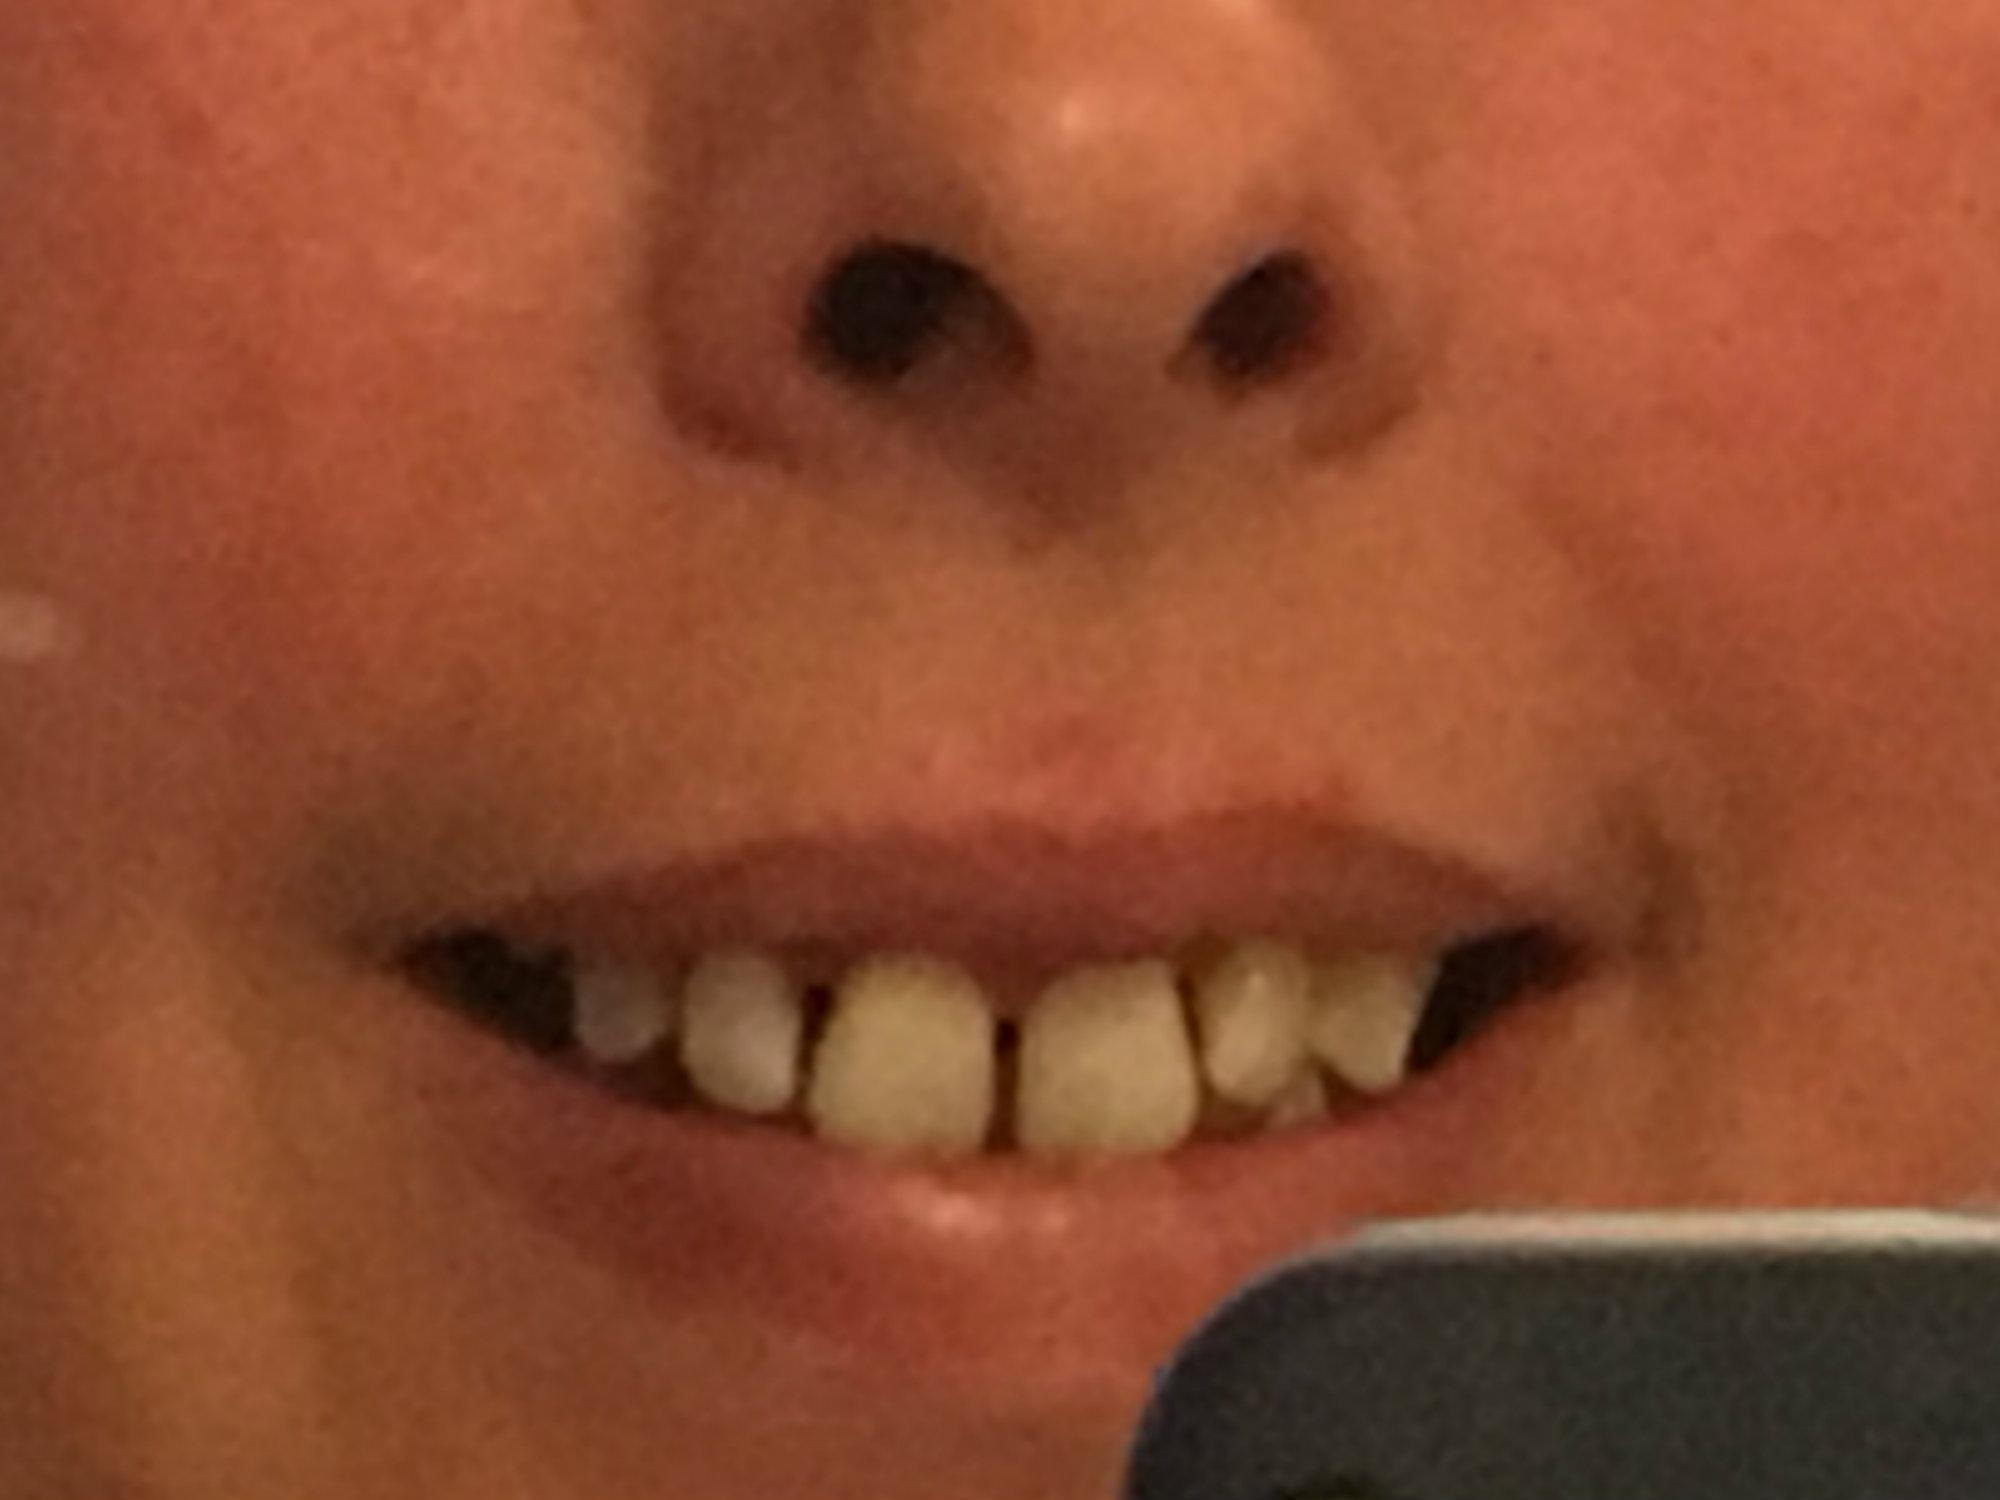 teeth and bits